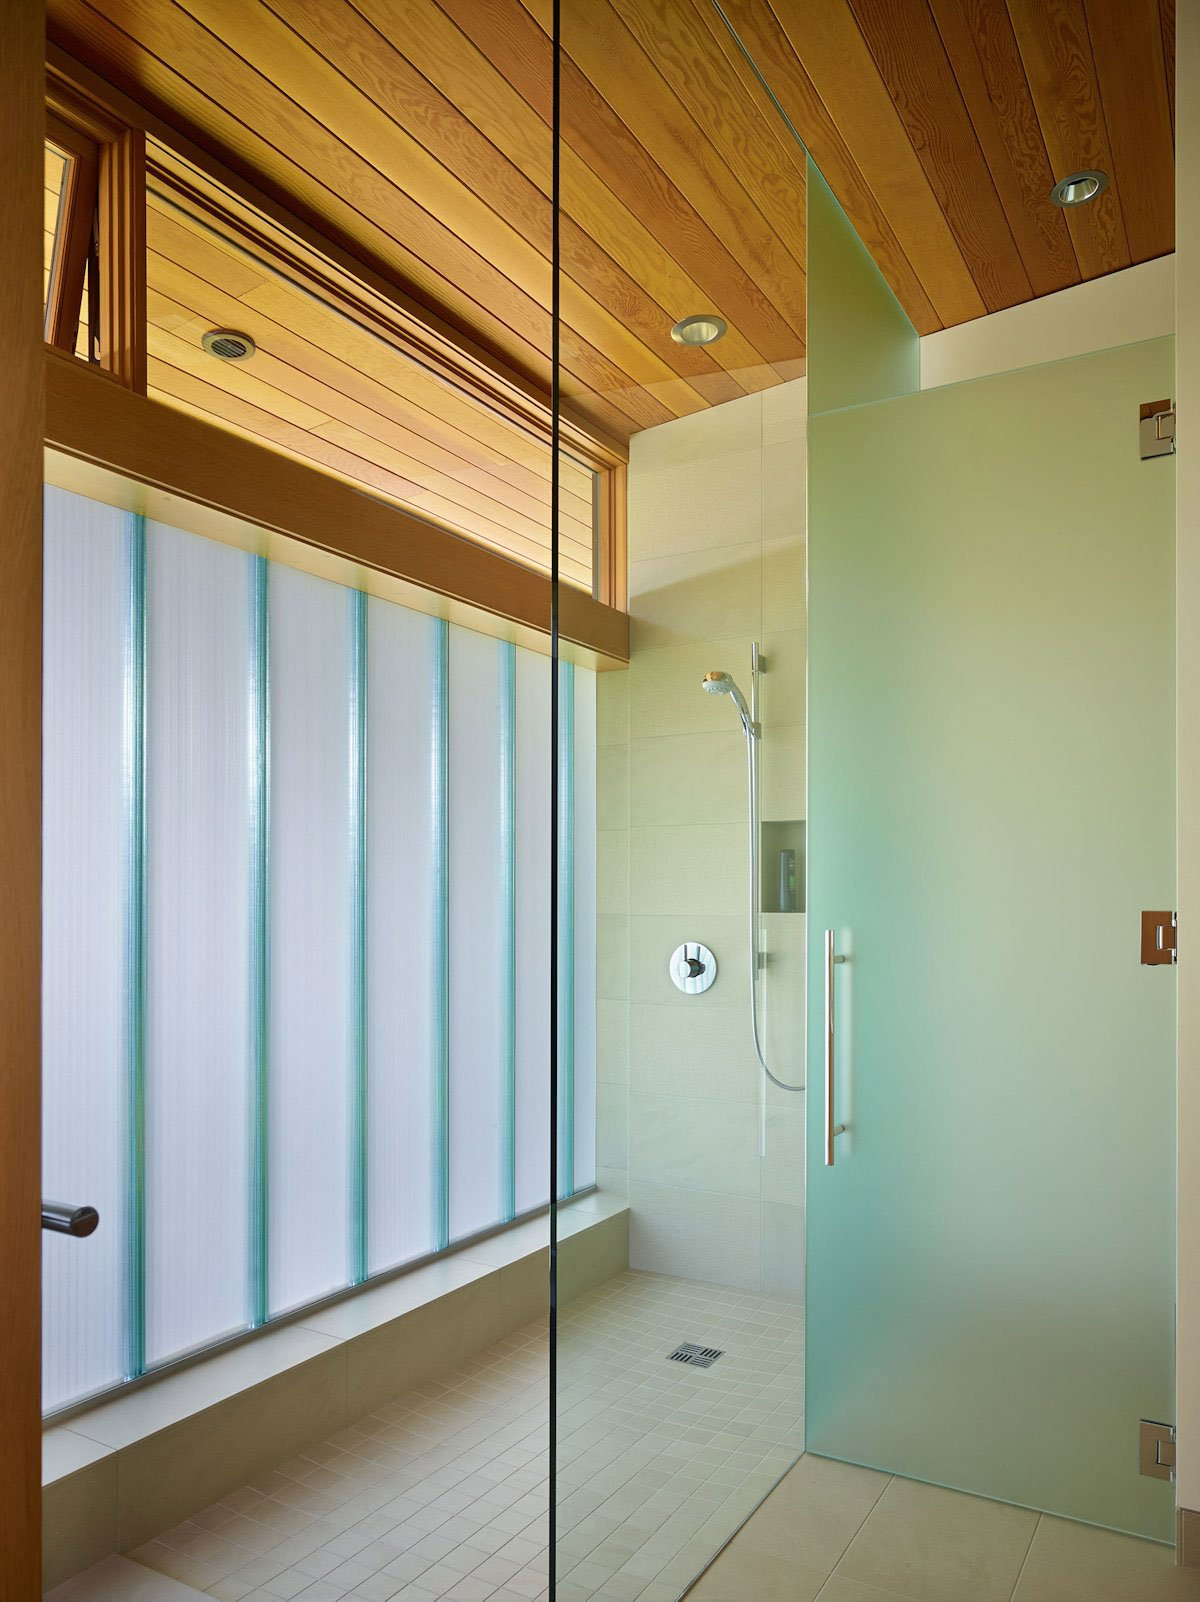 Courtyard-House-11